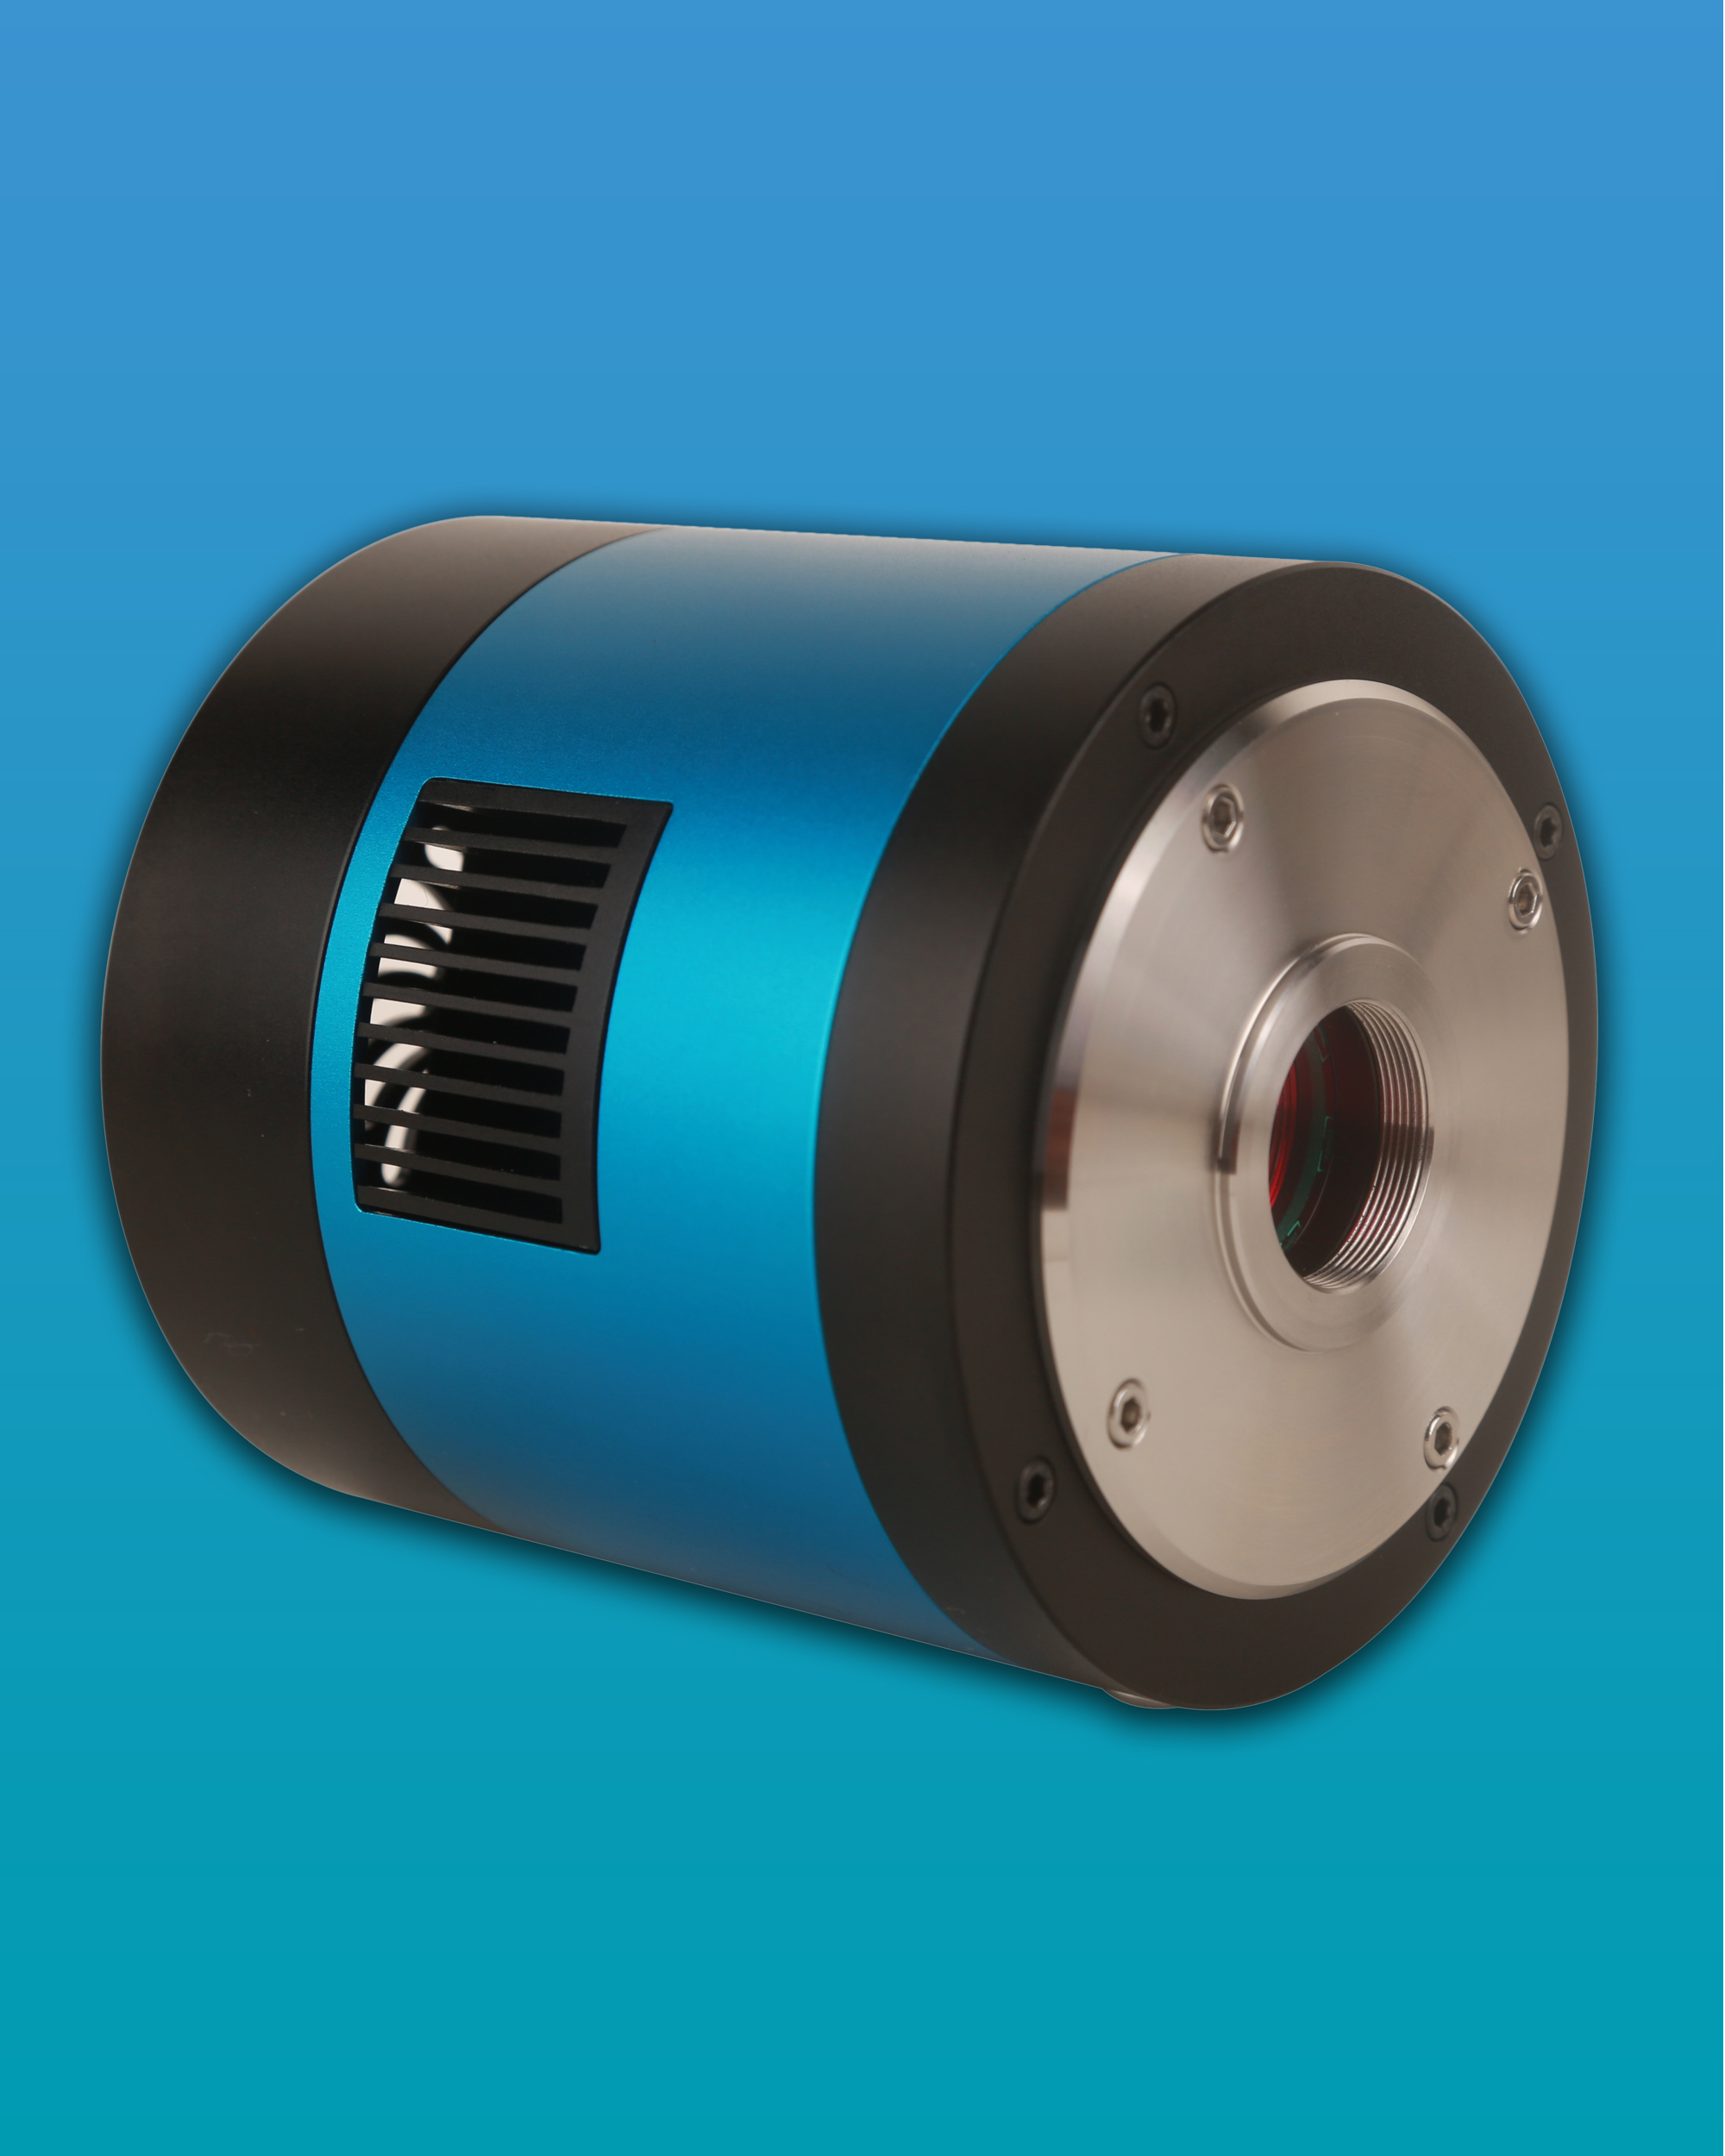 "[LC-23] 6.0M / ICX695AQG (C) 1"" (12.48x9.99) TE-Cooling C-mount USB3.0 CCD Camera"